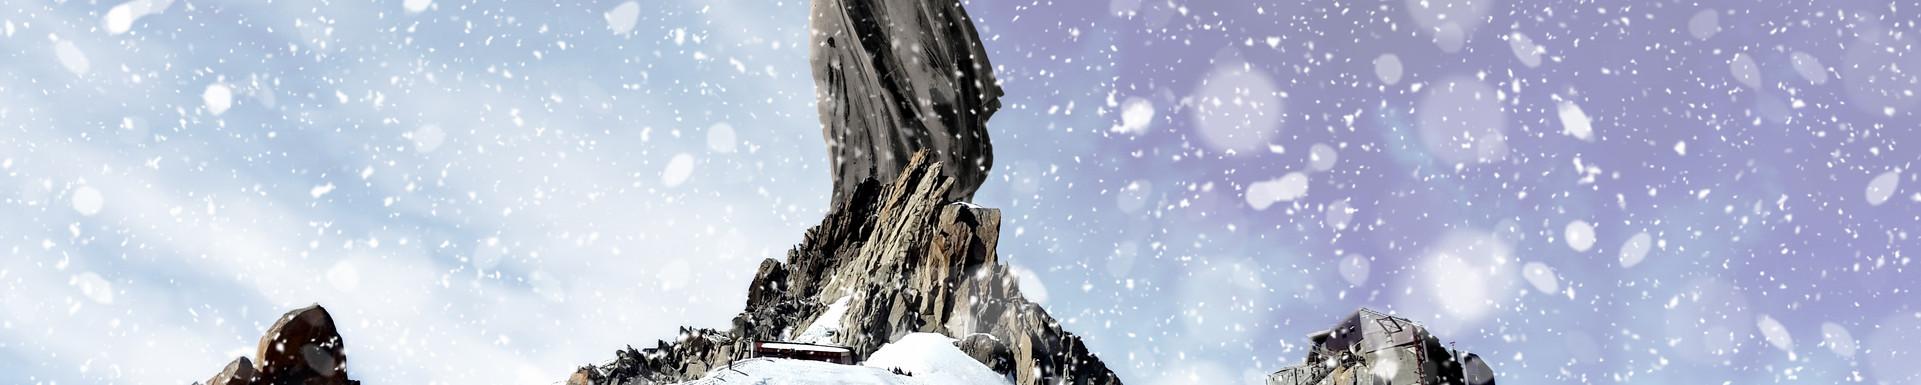 pic femme statue2.jpg